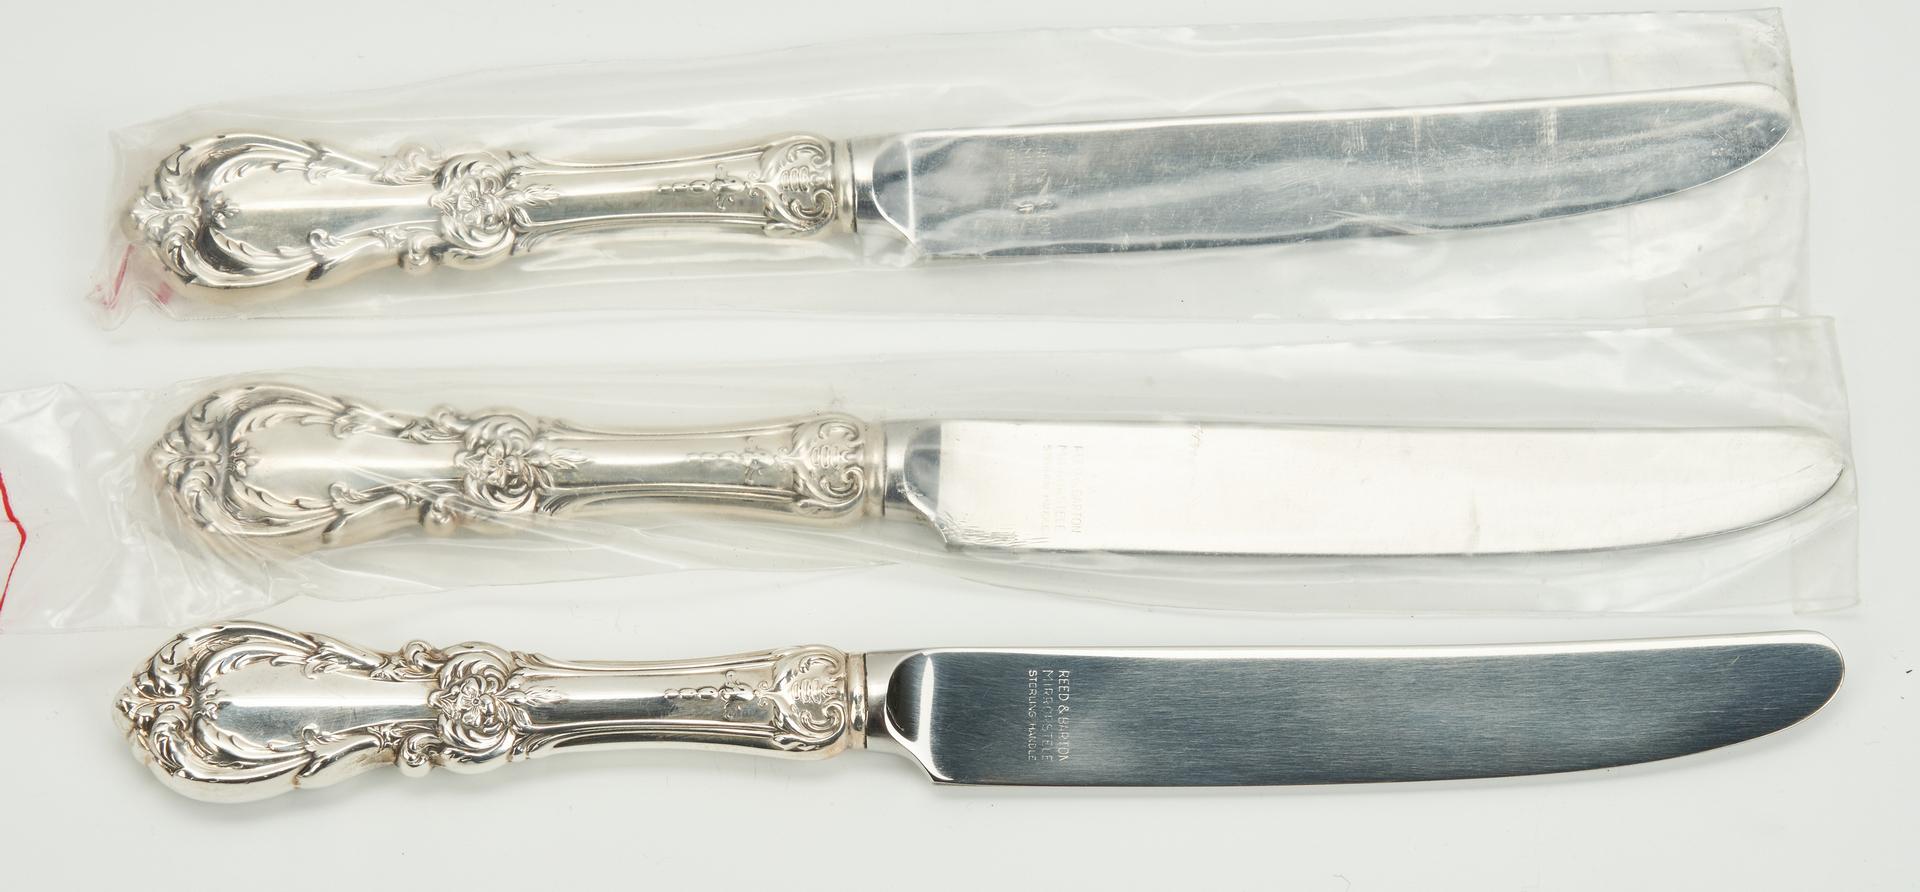 Lot 746: 46 Pcs. Sterling Silver, incl. Reed & Barton Francis I